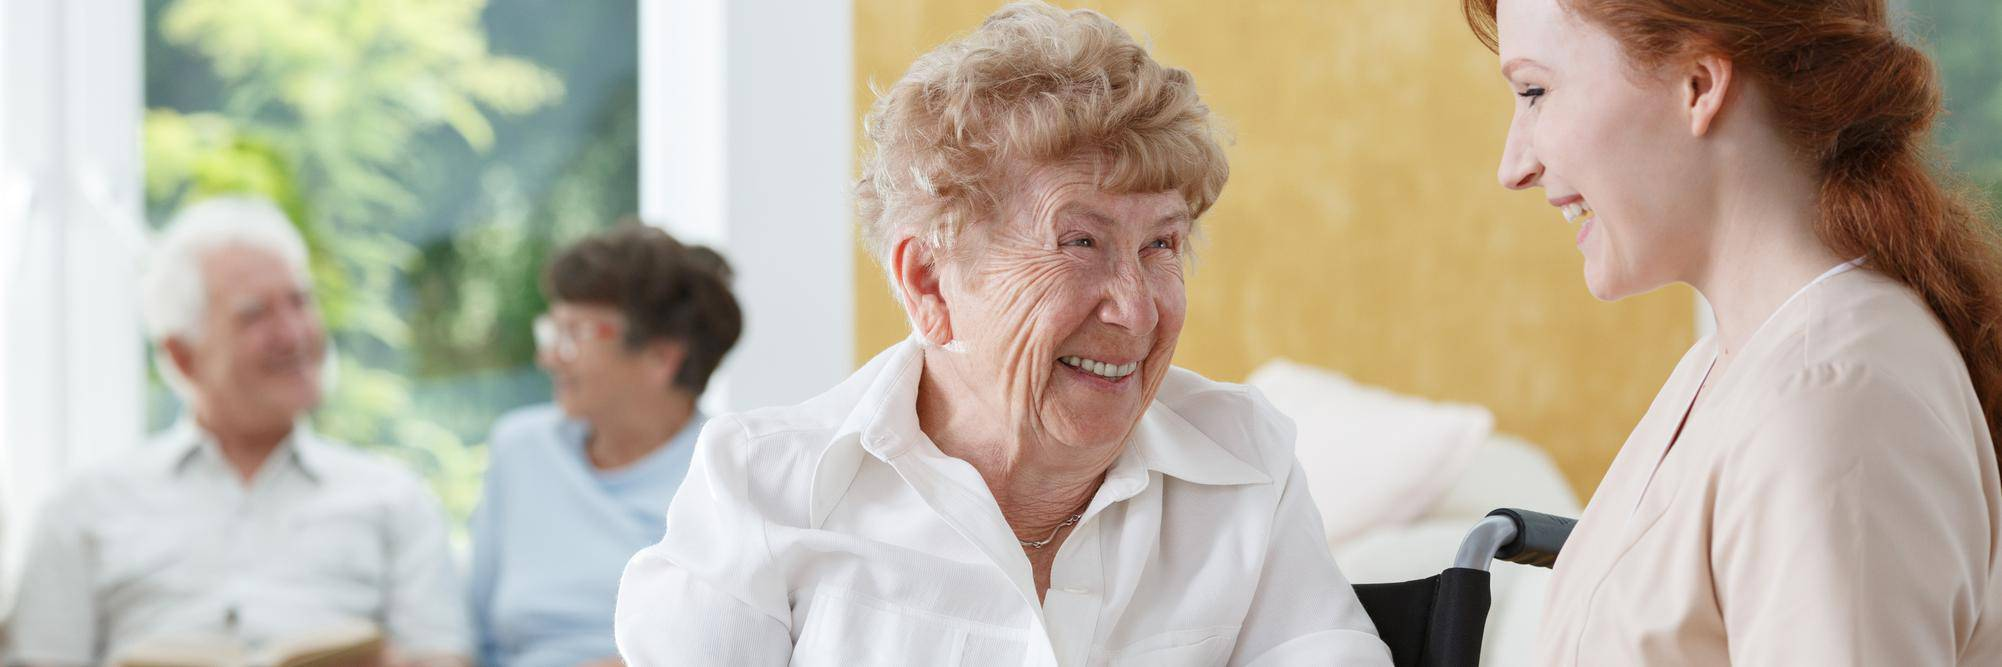 Altenpfleger (m/w/d)